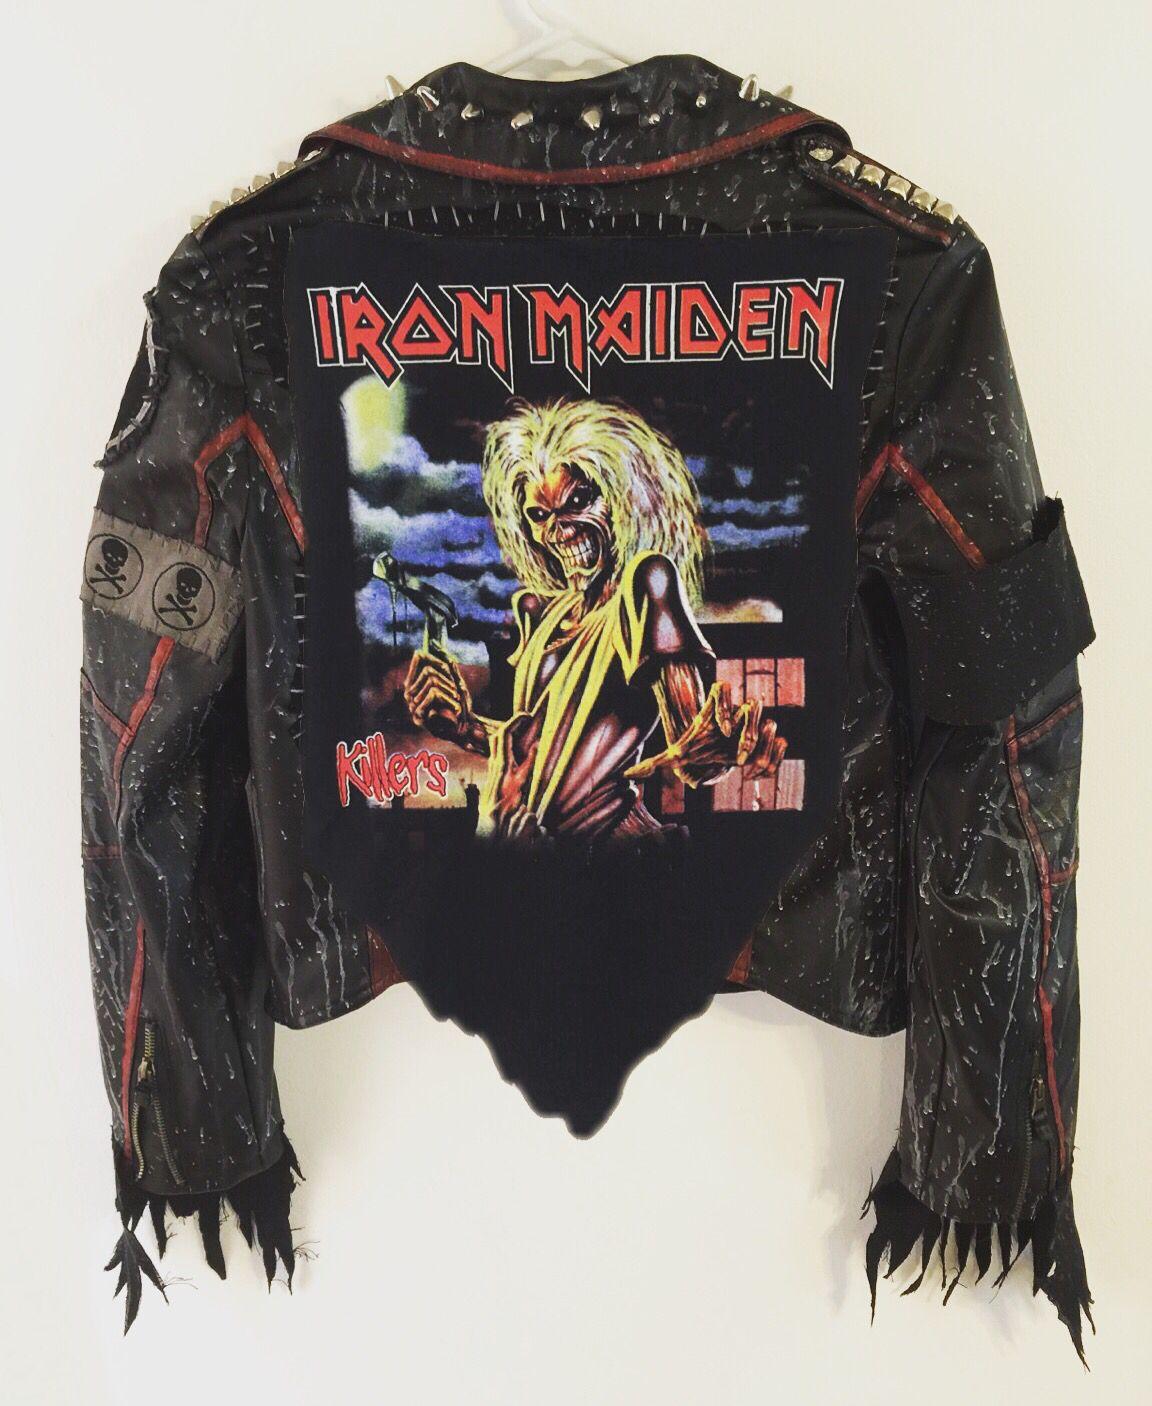 Iron Maiden Jacket From Chad Cherry Clothing Distressed Jacket Black Jacket Rocker Jacket Custom J Types Of Fashion Styles Heavy Metal Fashion Punk Outfits [ 1406 x 1152 Pixel ]